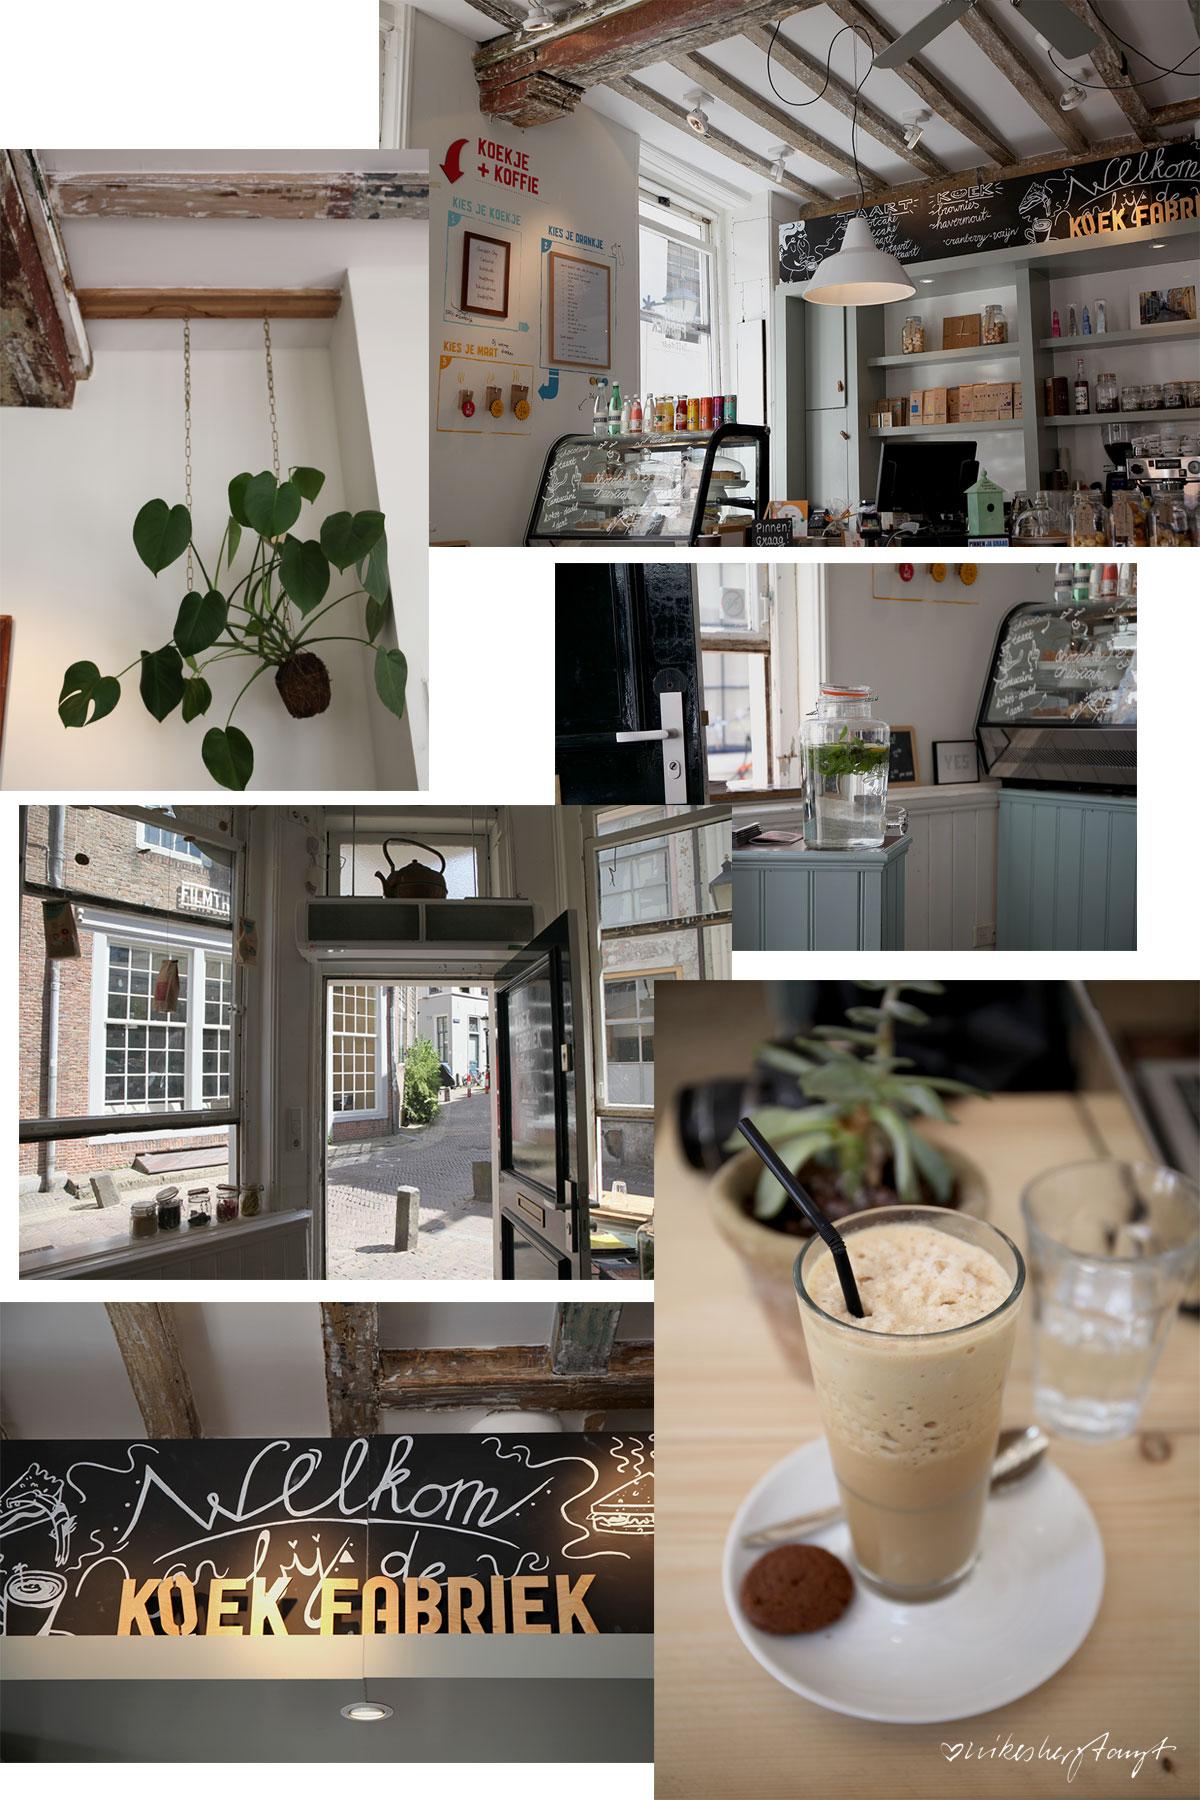 de koek fabriek in utrecht. kulinarische Tour durch Utrecht // nikesherztanzt